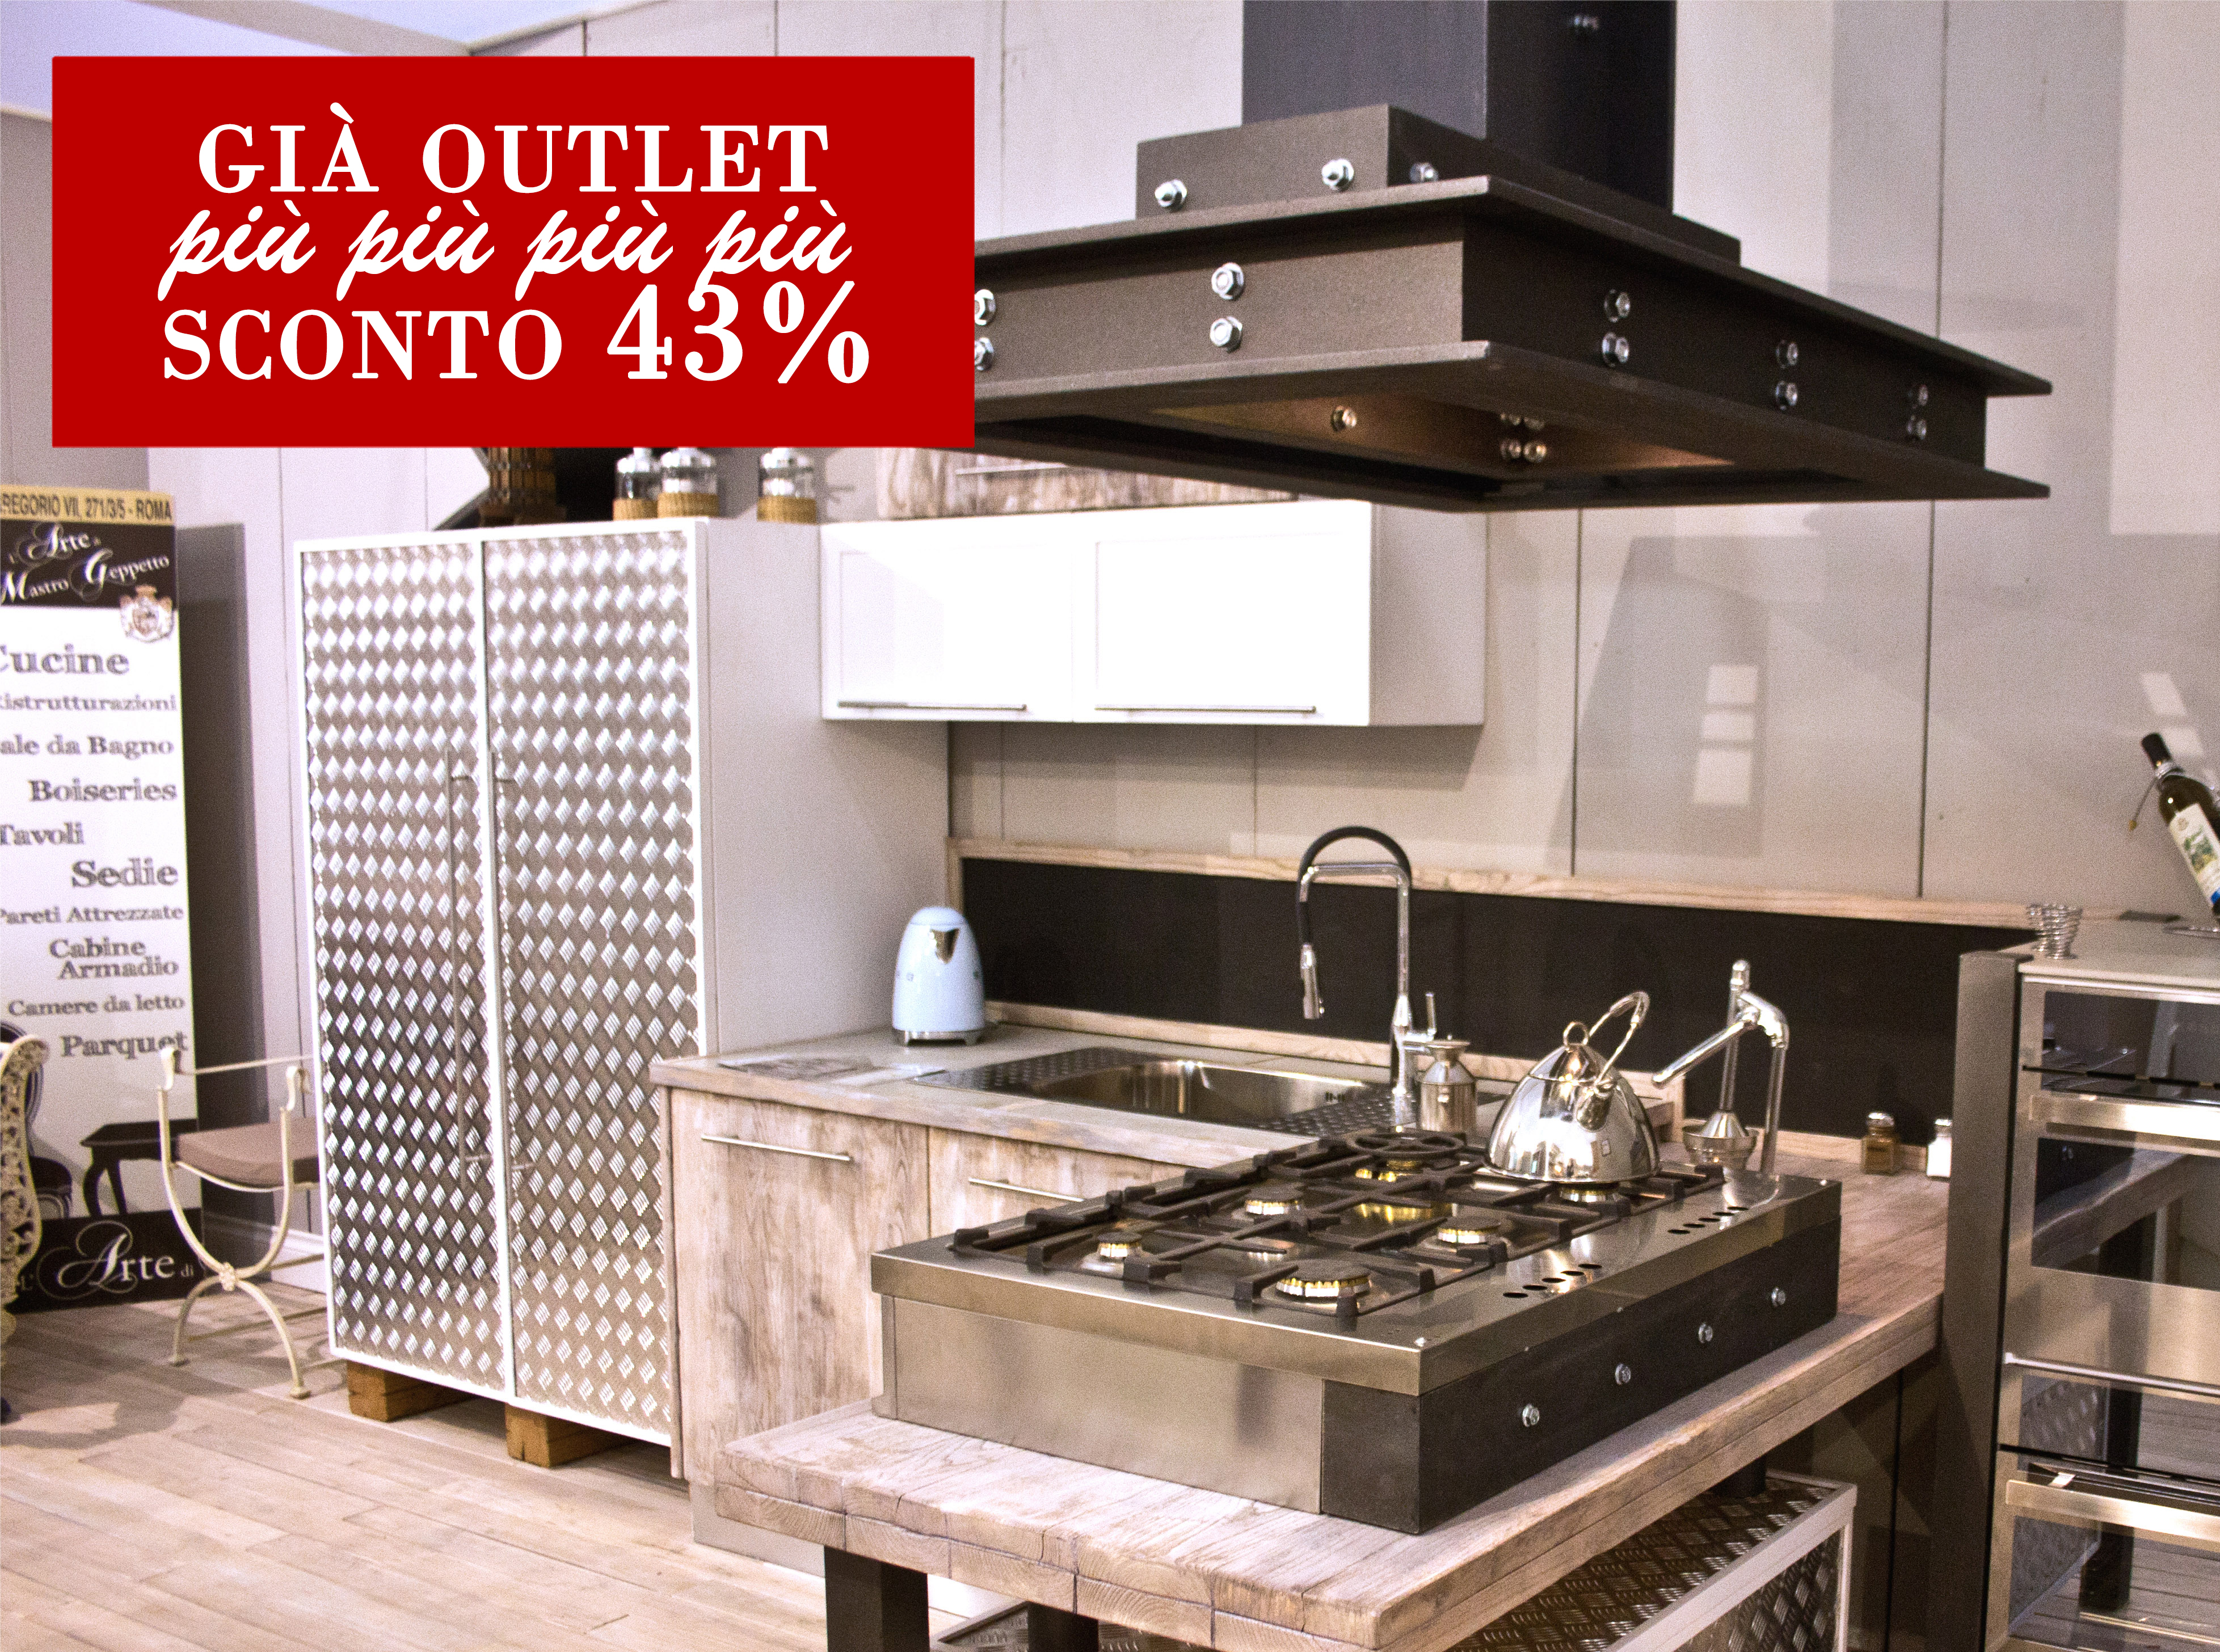 Sconto 43 Cucine Moderne Inobili Casa Cucine Su Misura A Roma